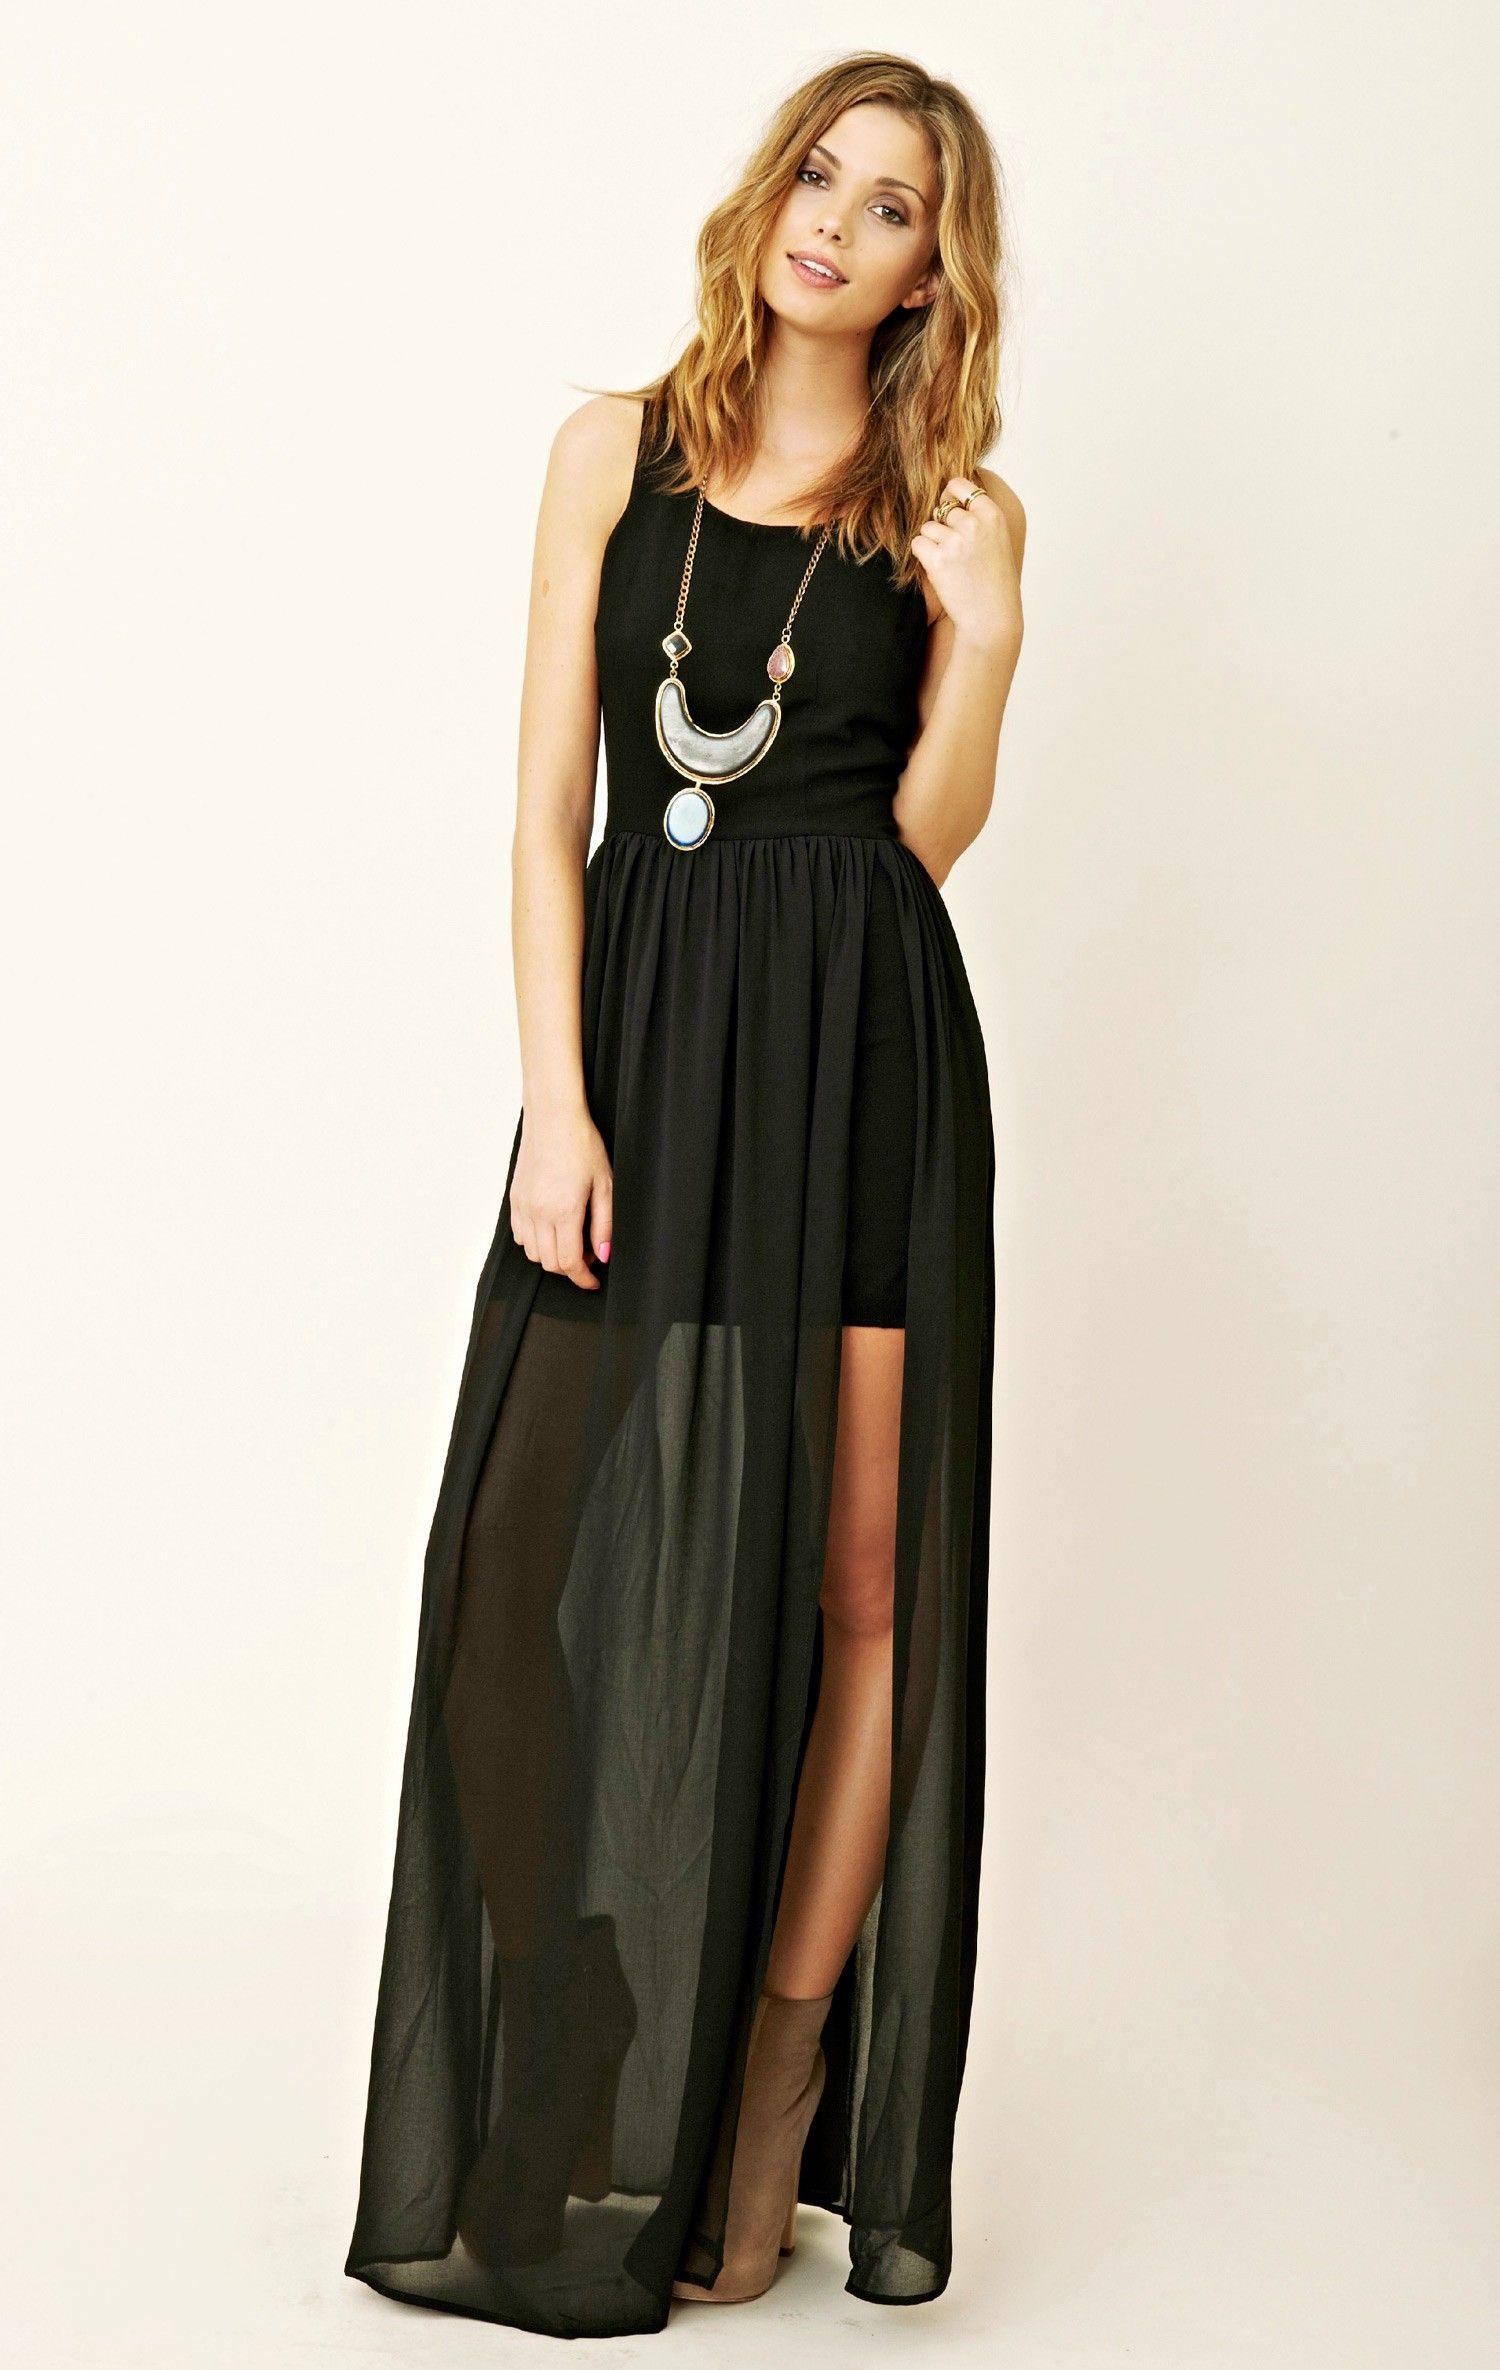 c646c3860c26 My Way Home Maxi Dress